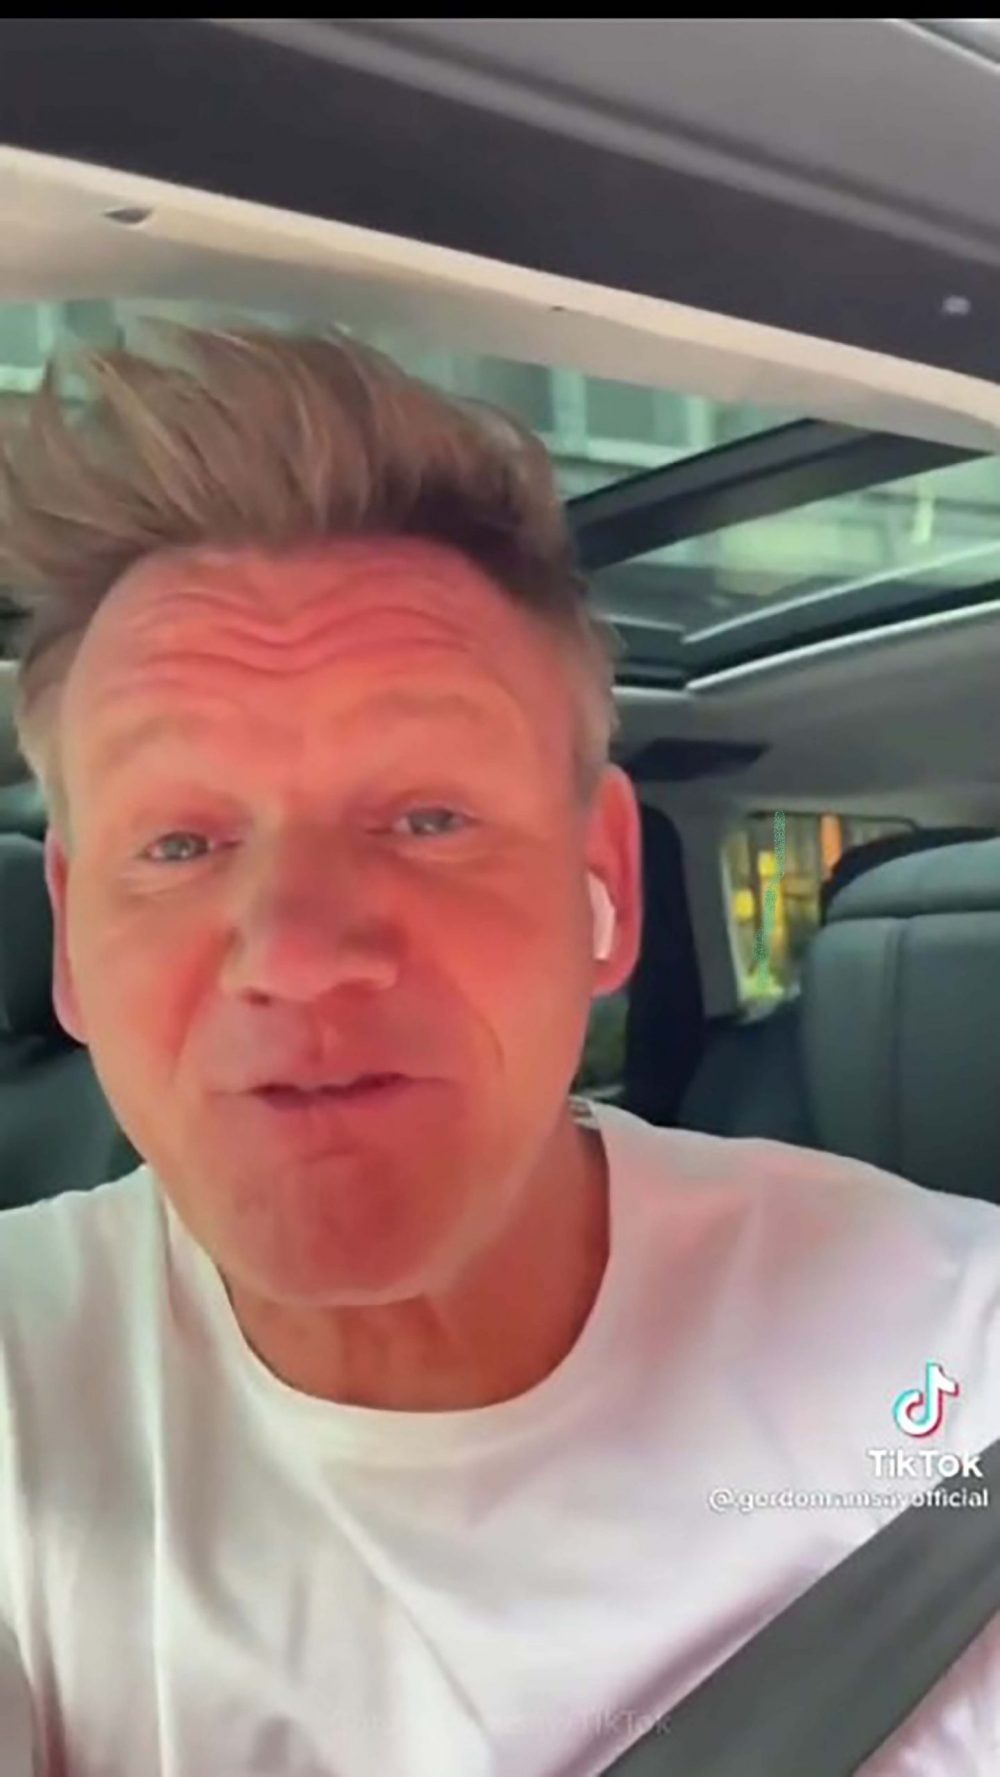 Gordon Ramsay - Food and Drink News UK